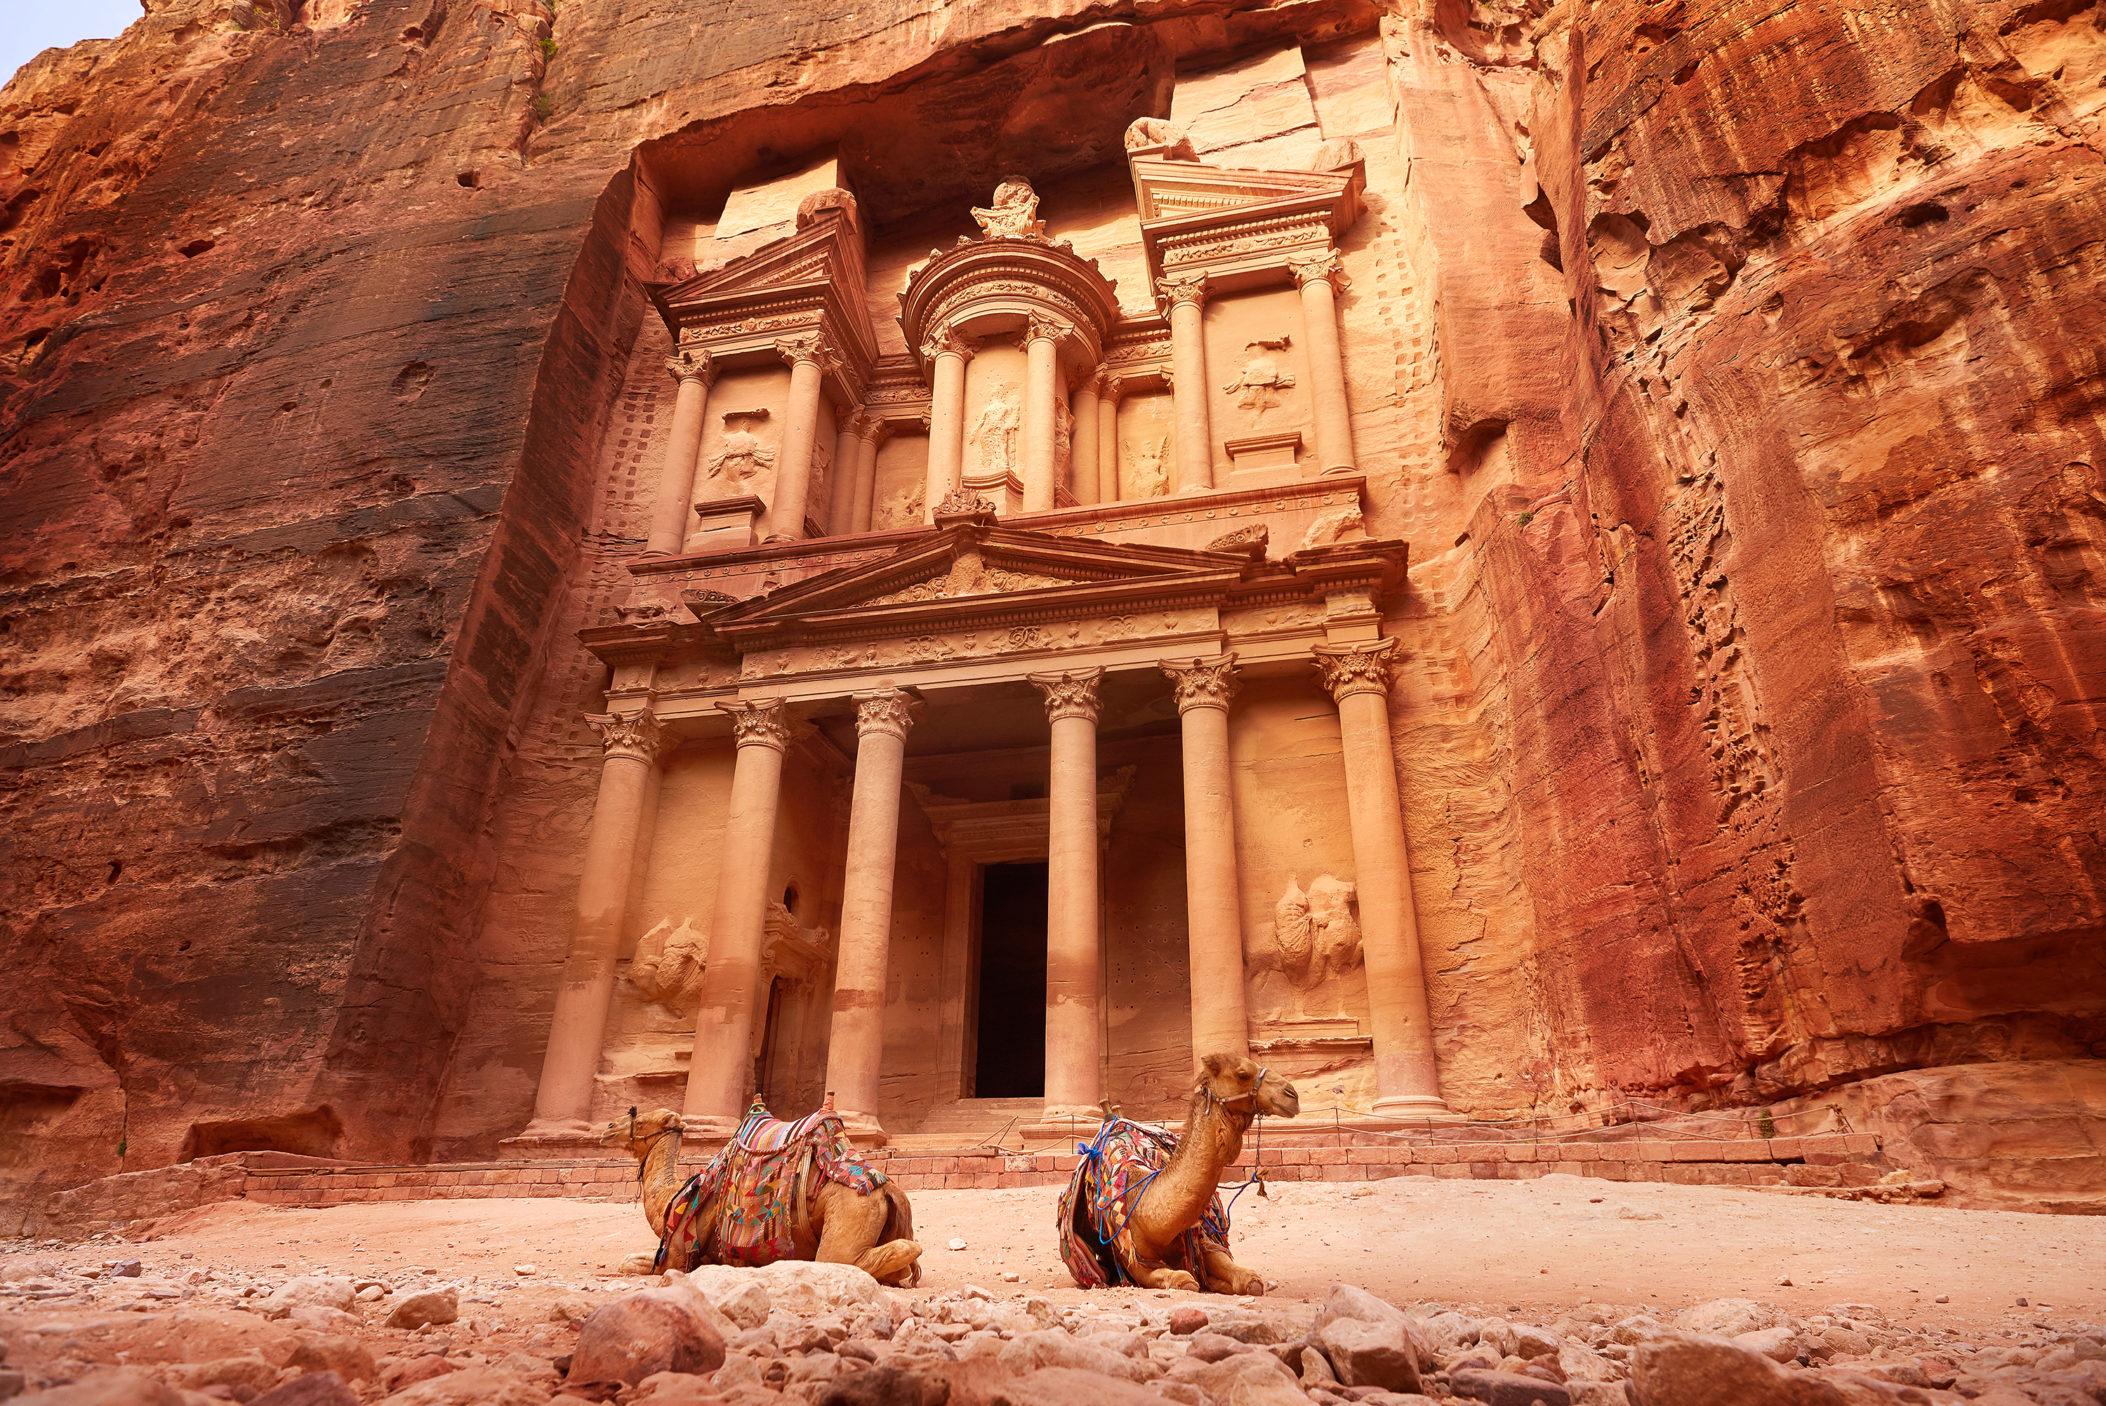 Jordan [Shutterstock]